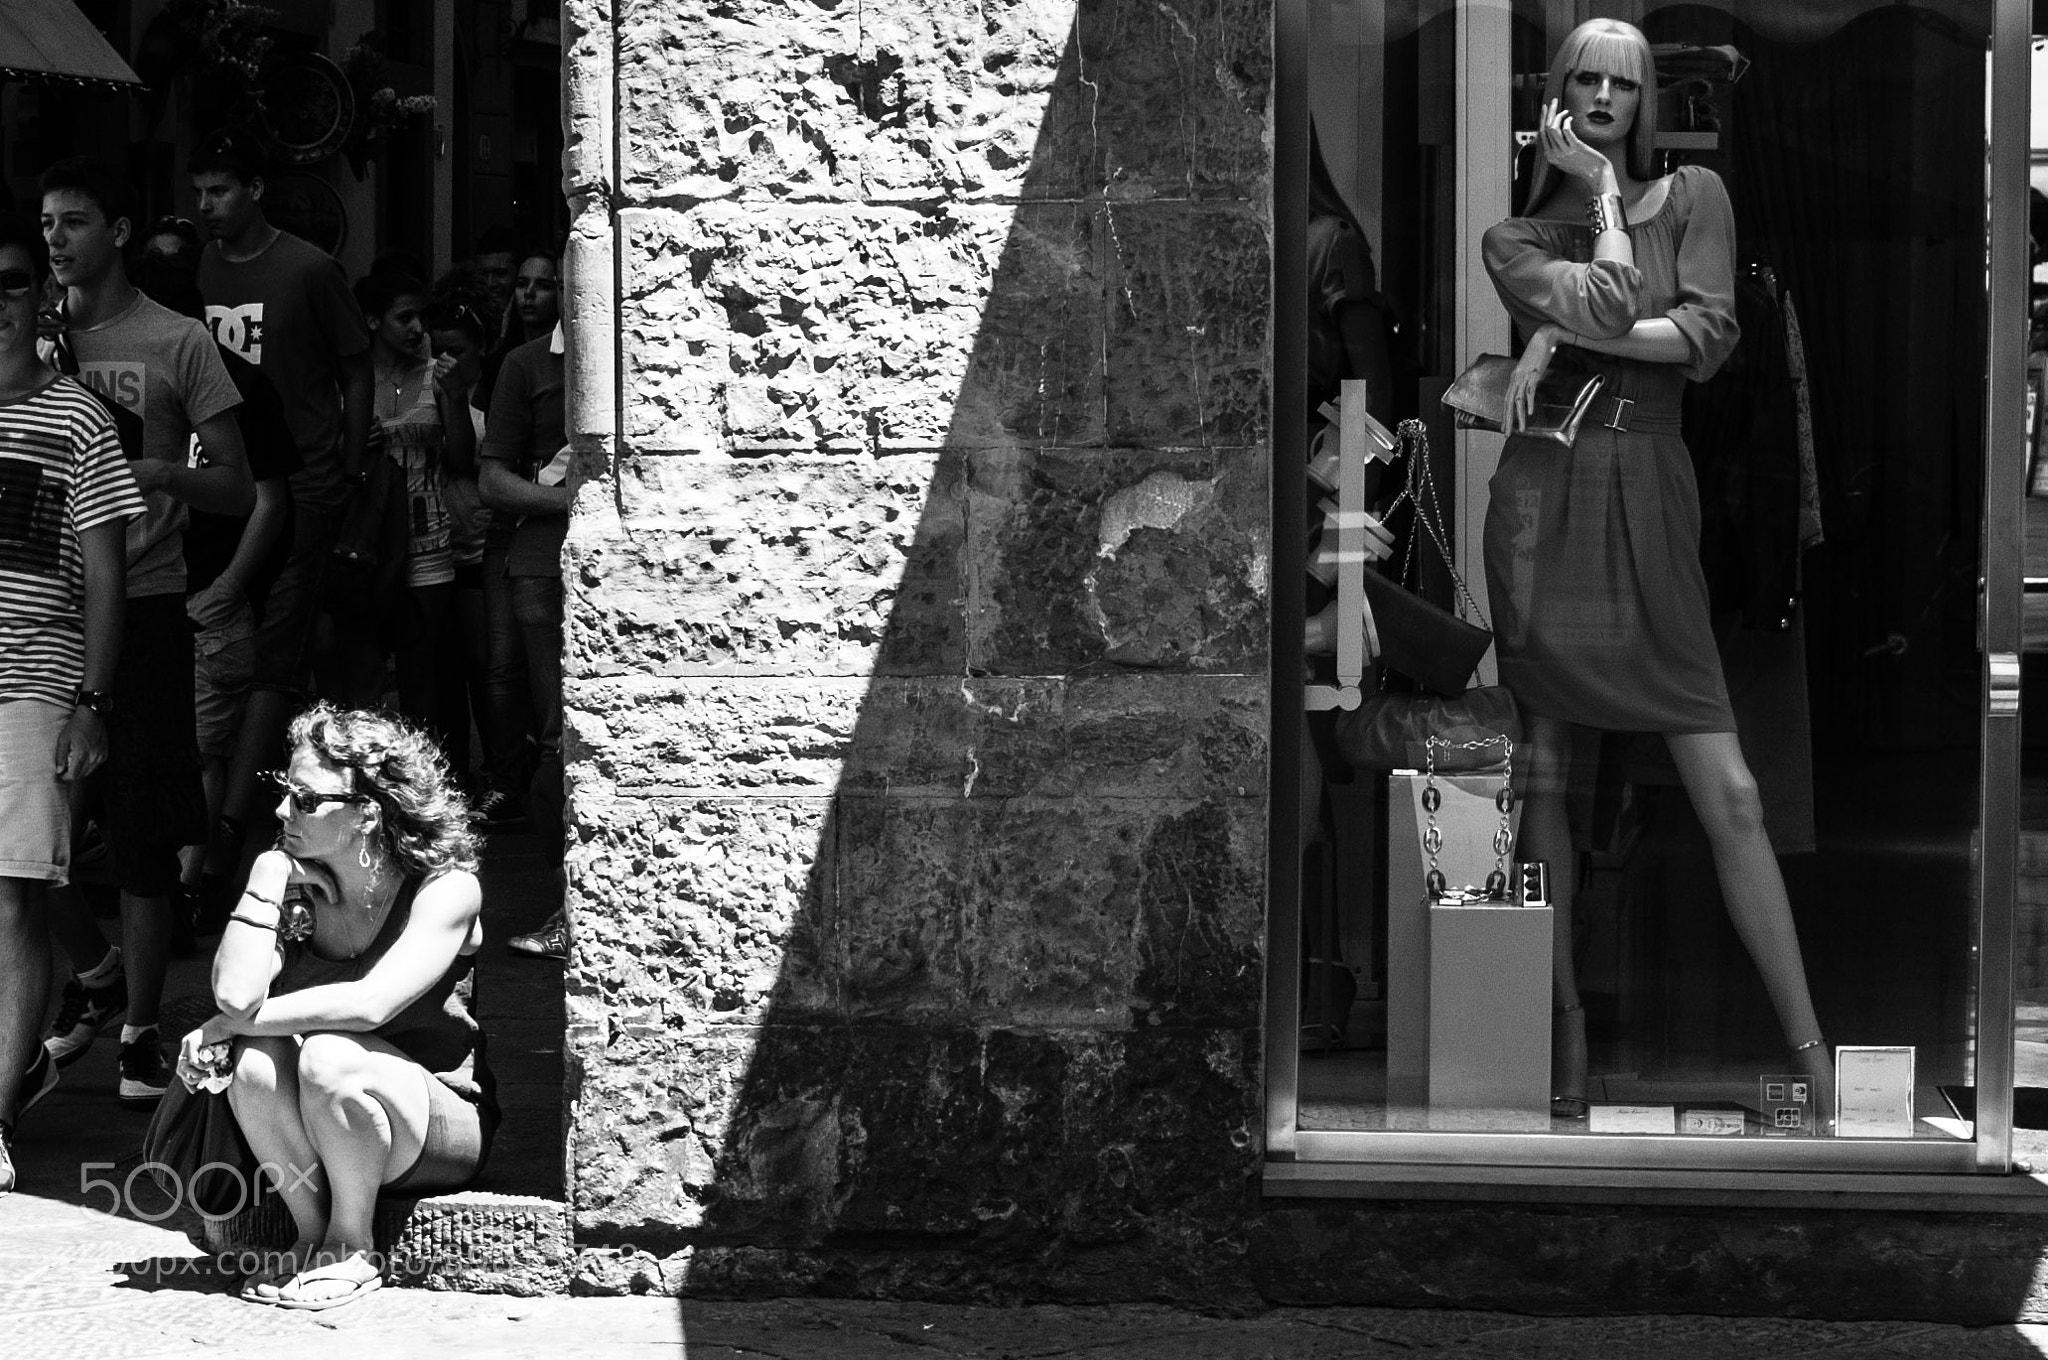 Photograph Sister by Fabio Zerbino on 500px